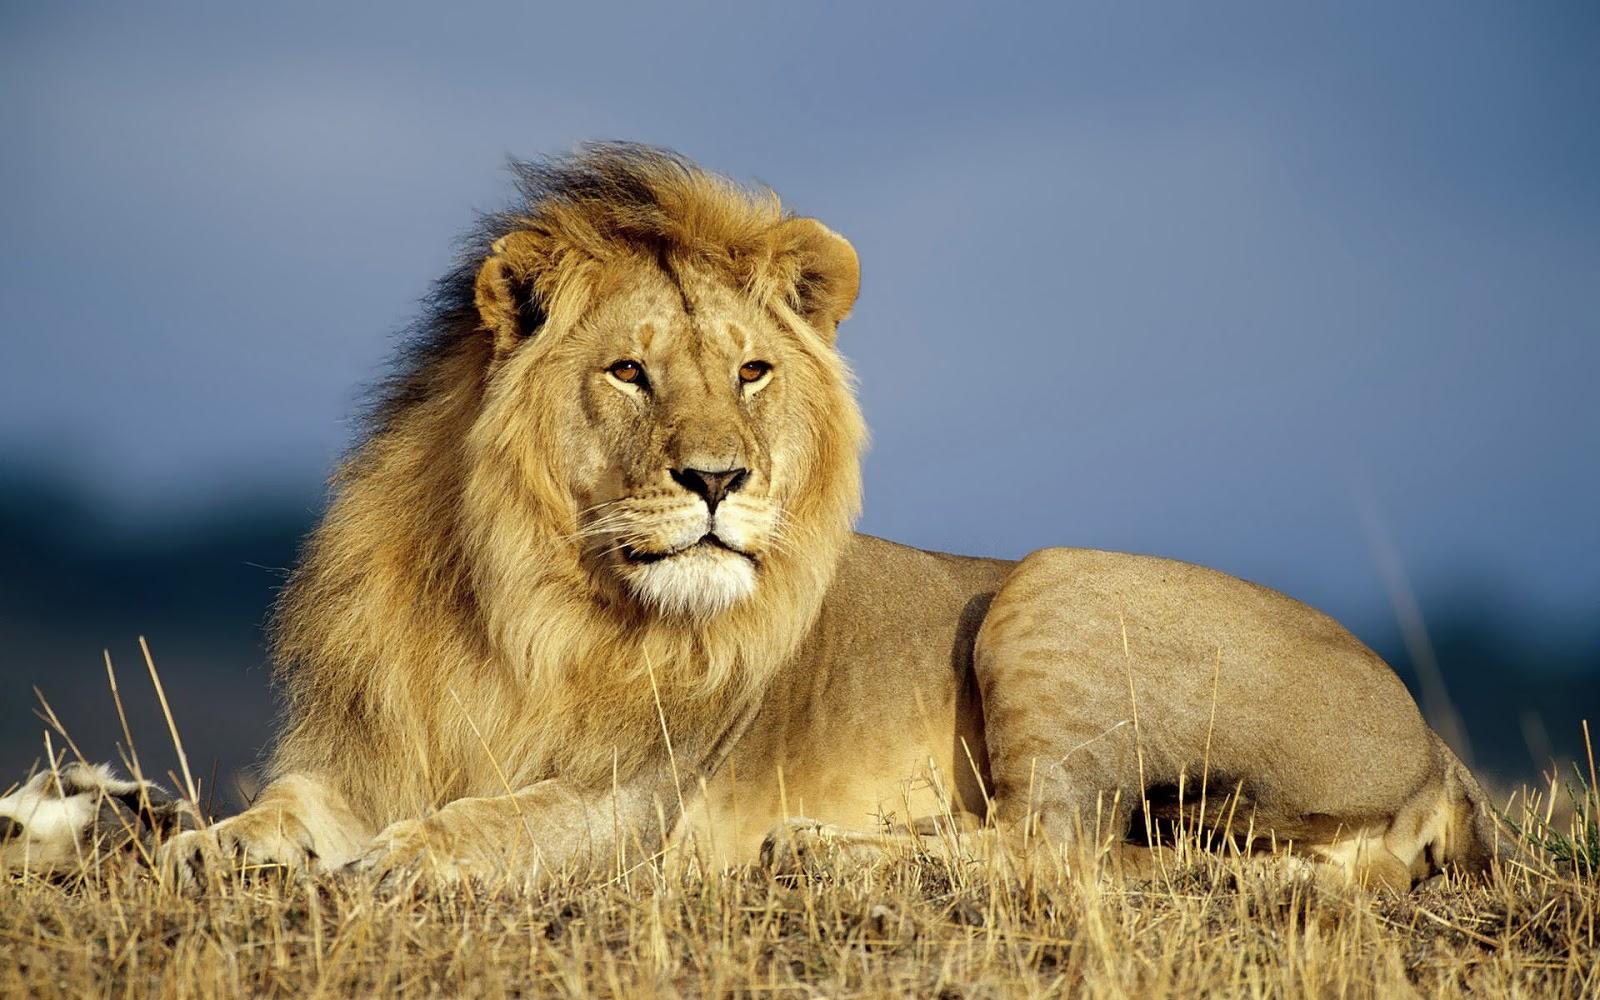 Beautiful Wallpaper Of A Big Lion Animal Wallpaper For Pc 1600x1000 Wallpaper Teahub Io